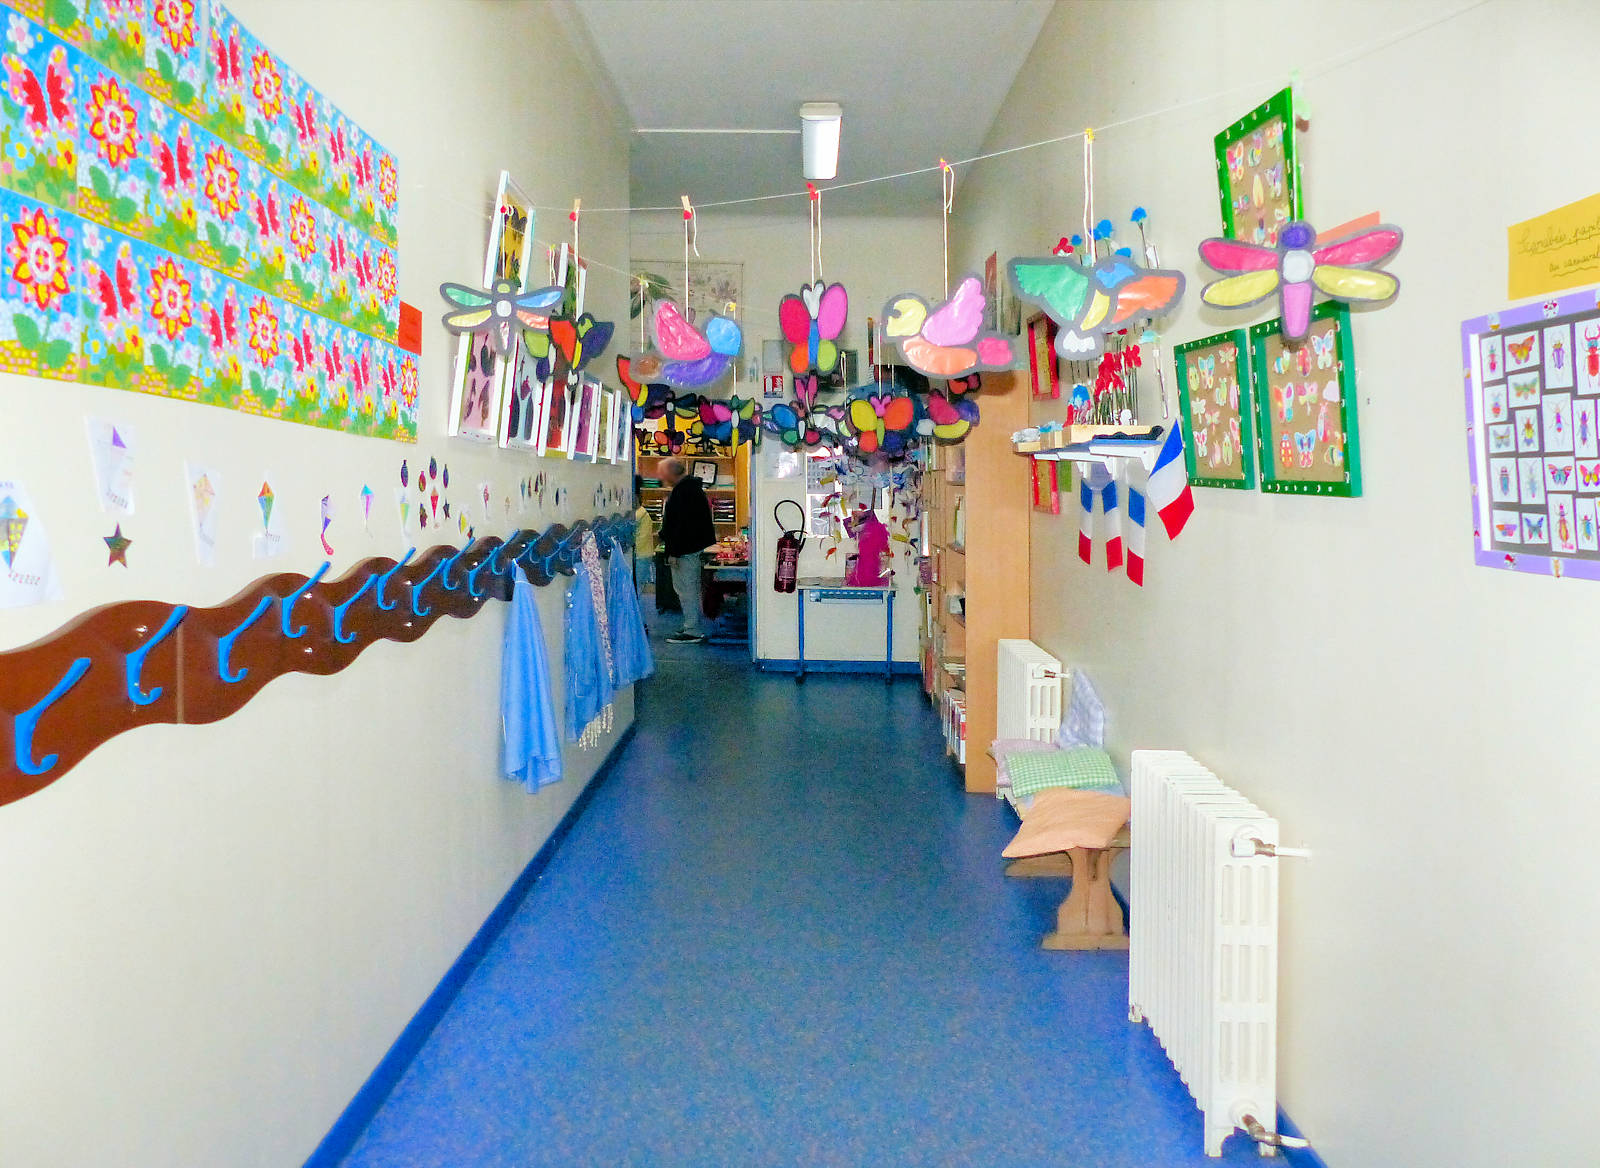 Couloirs École Primaire CNDI - Tourcoing, rue des Anges.